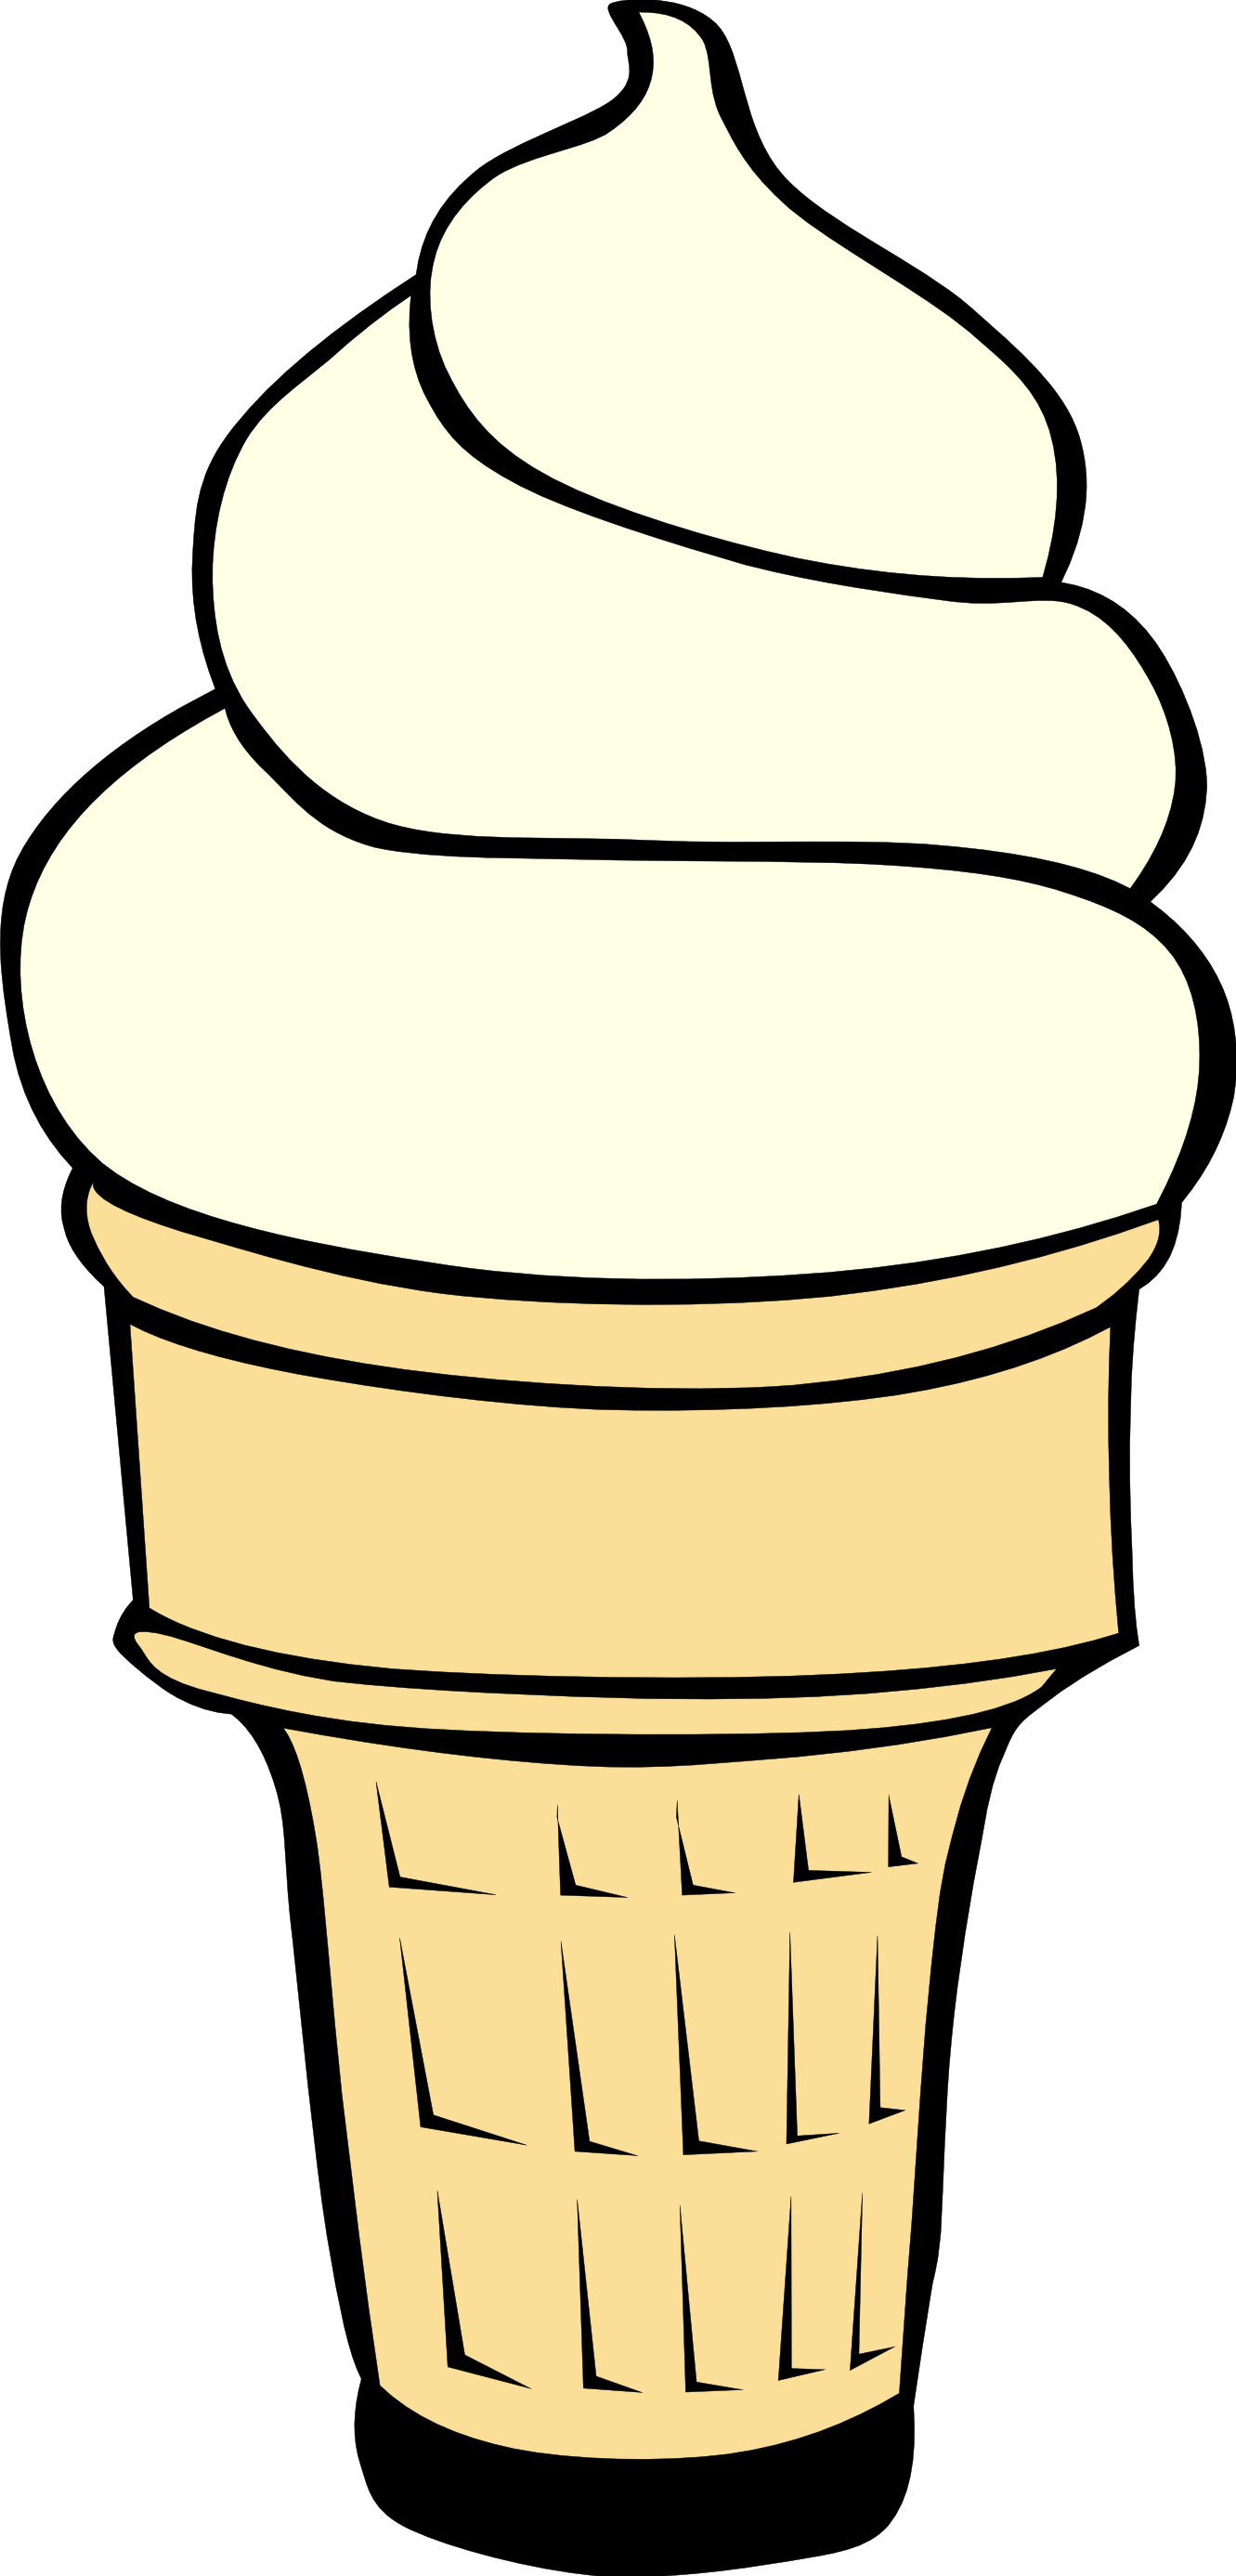 1331x2773 Ice Cream Black And White Melting Ice Cream Cone Clipart Black